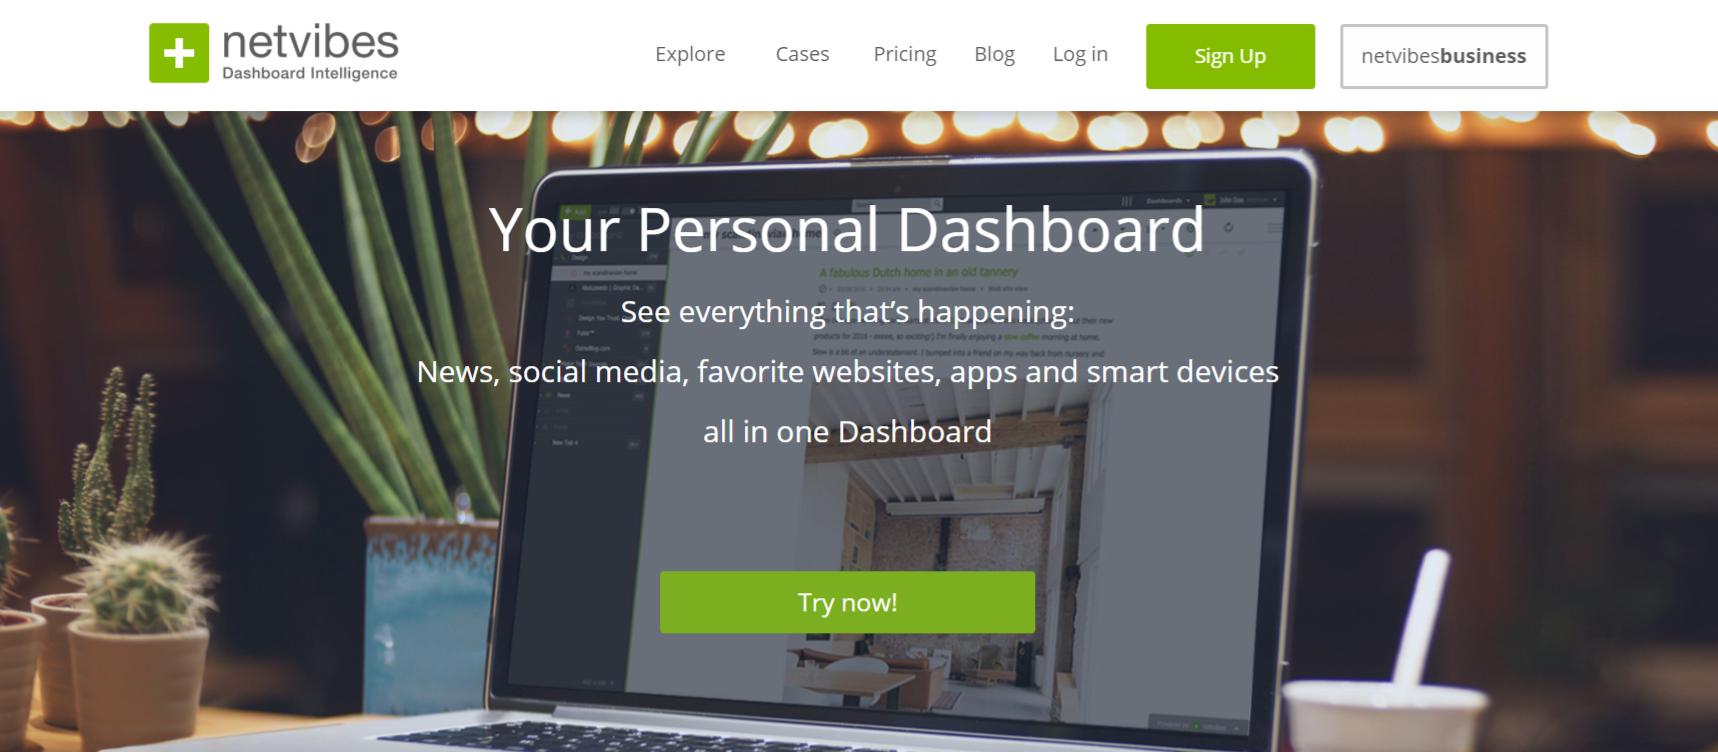 Netvibes: Collaborative bookmarking tools